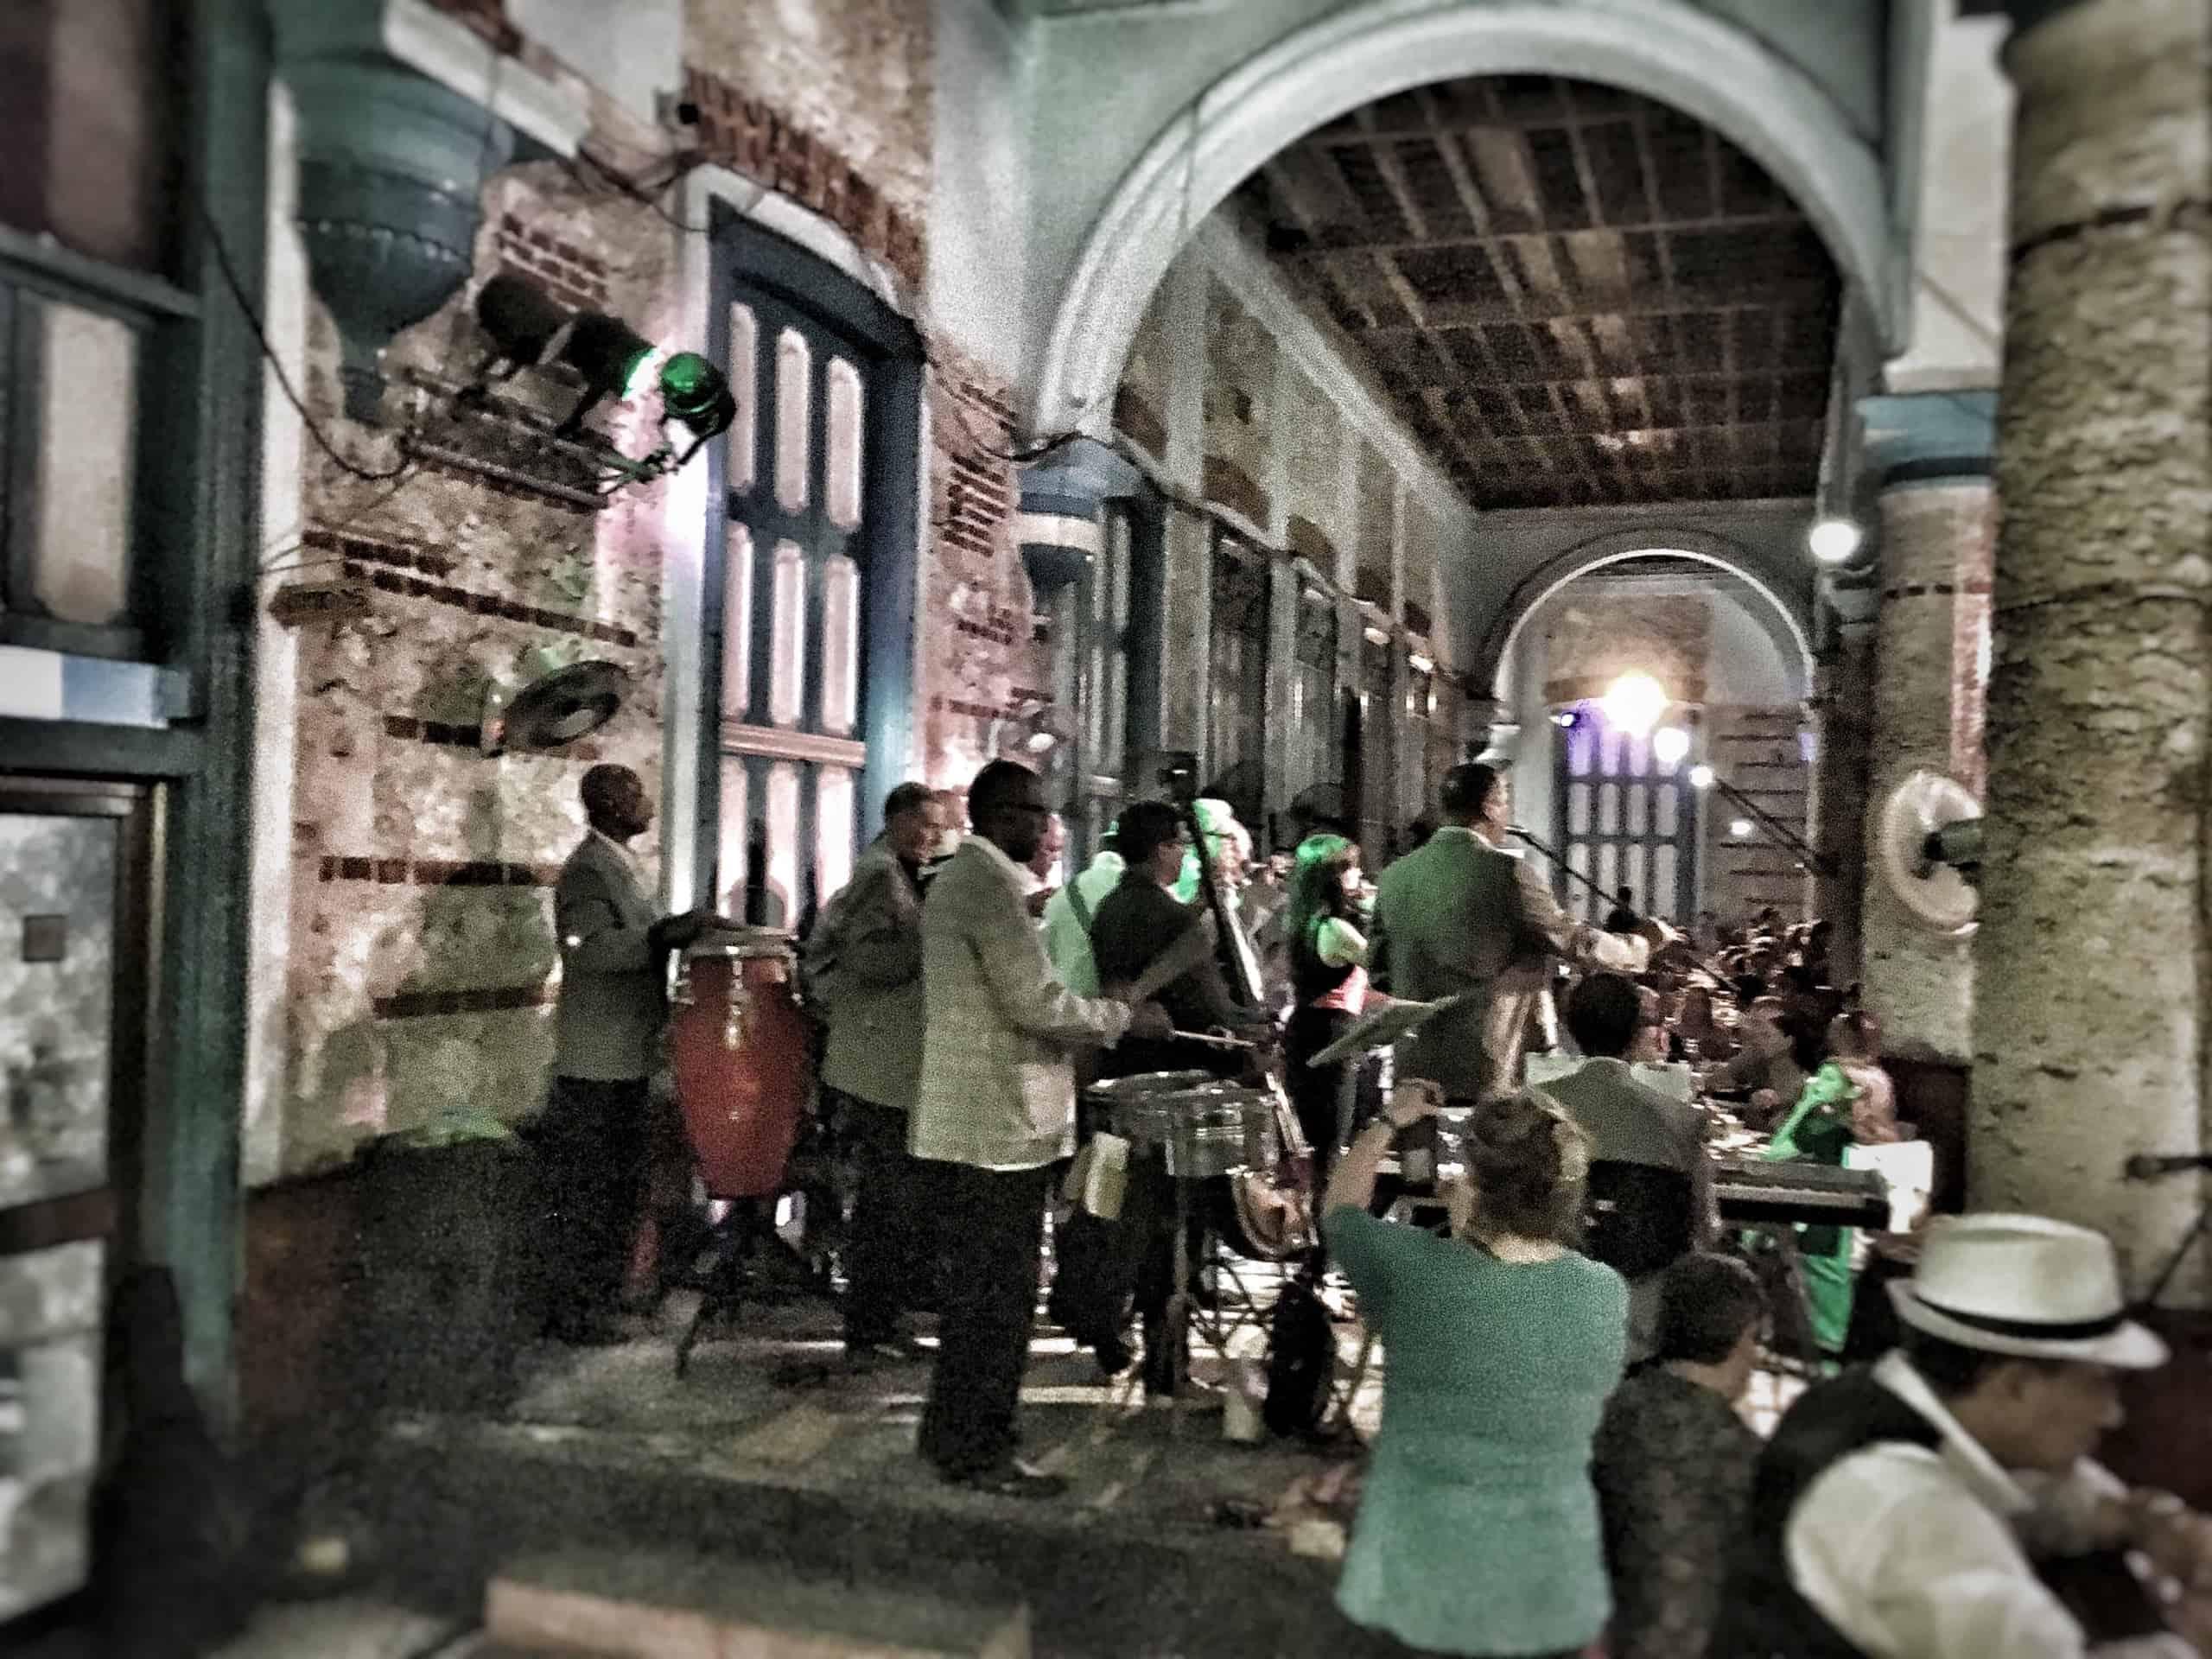 buena vista social club in cuba